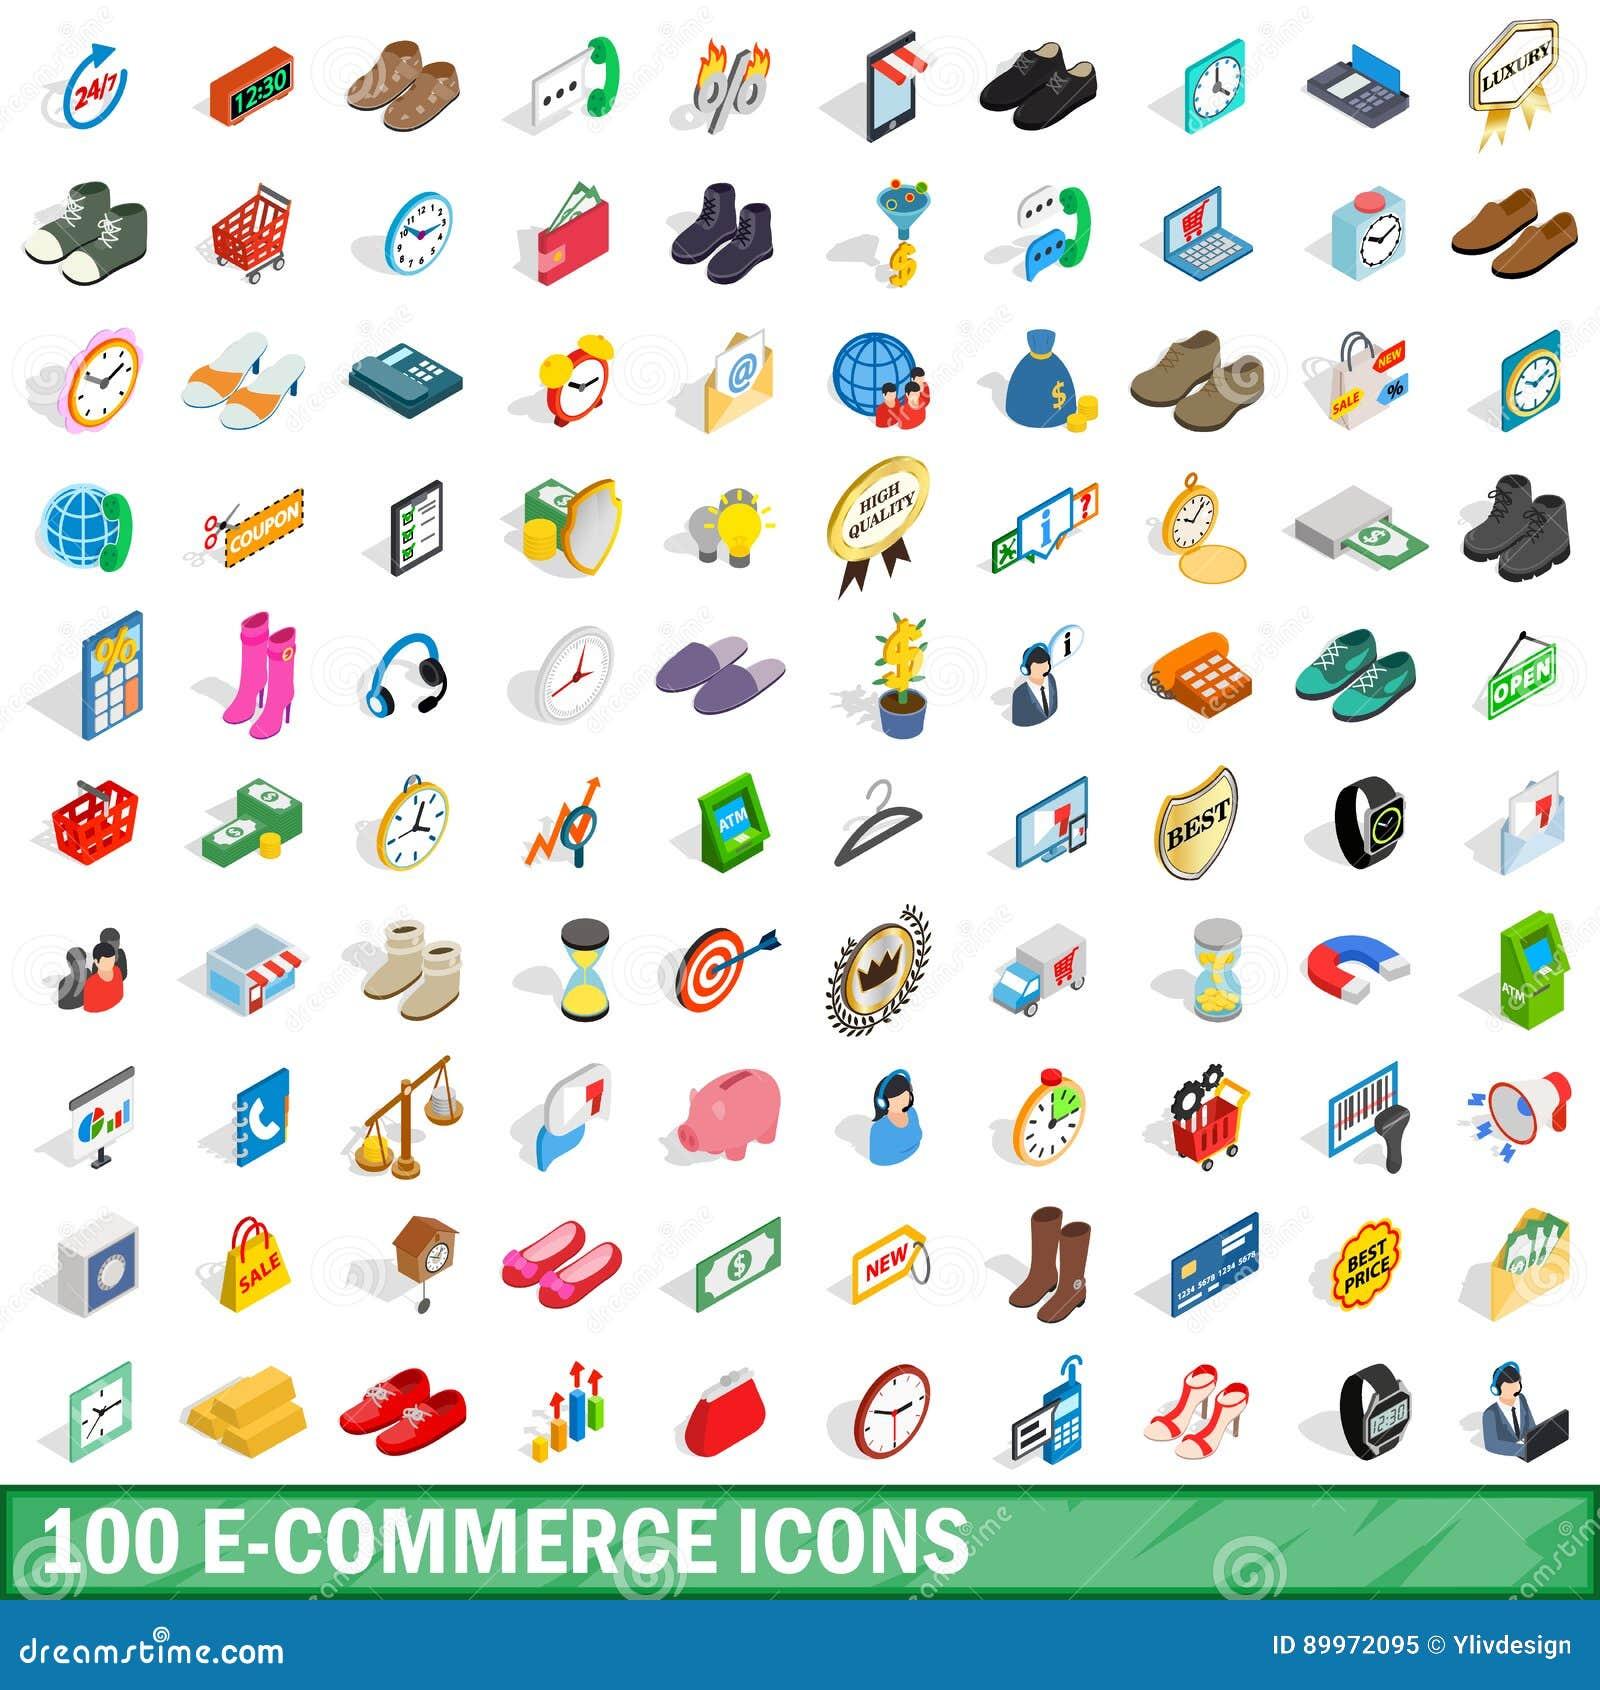 100 E-Commerce-Ikonen eingestellt, isometrische Art 3d